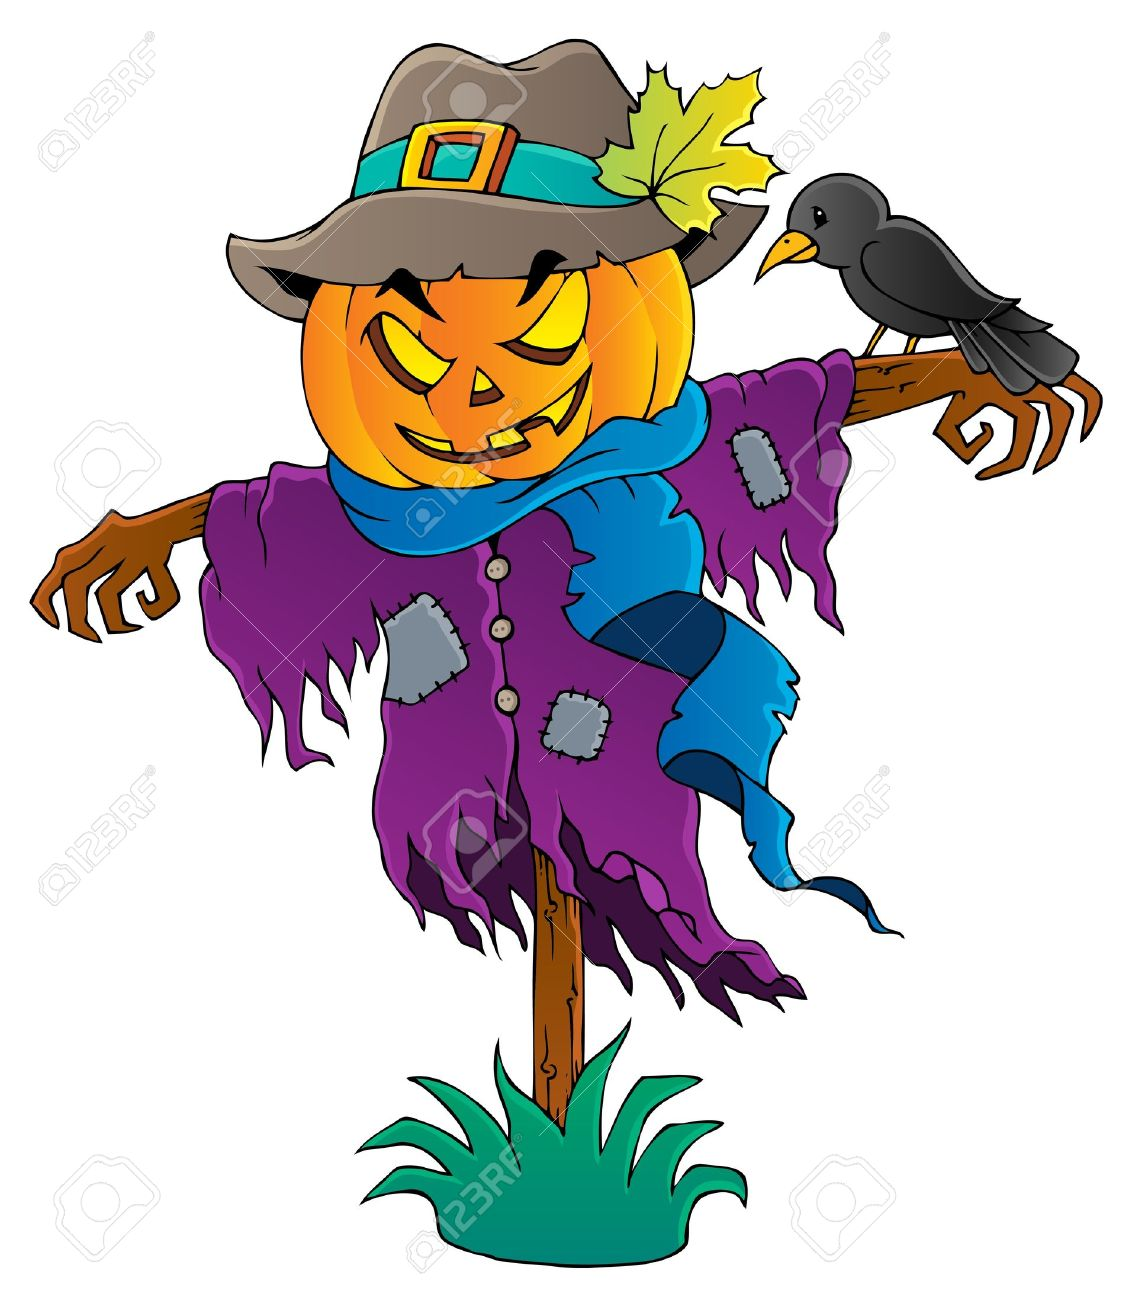 halloween scarecrow stock vector 15374202 - Halloween Scare Crow